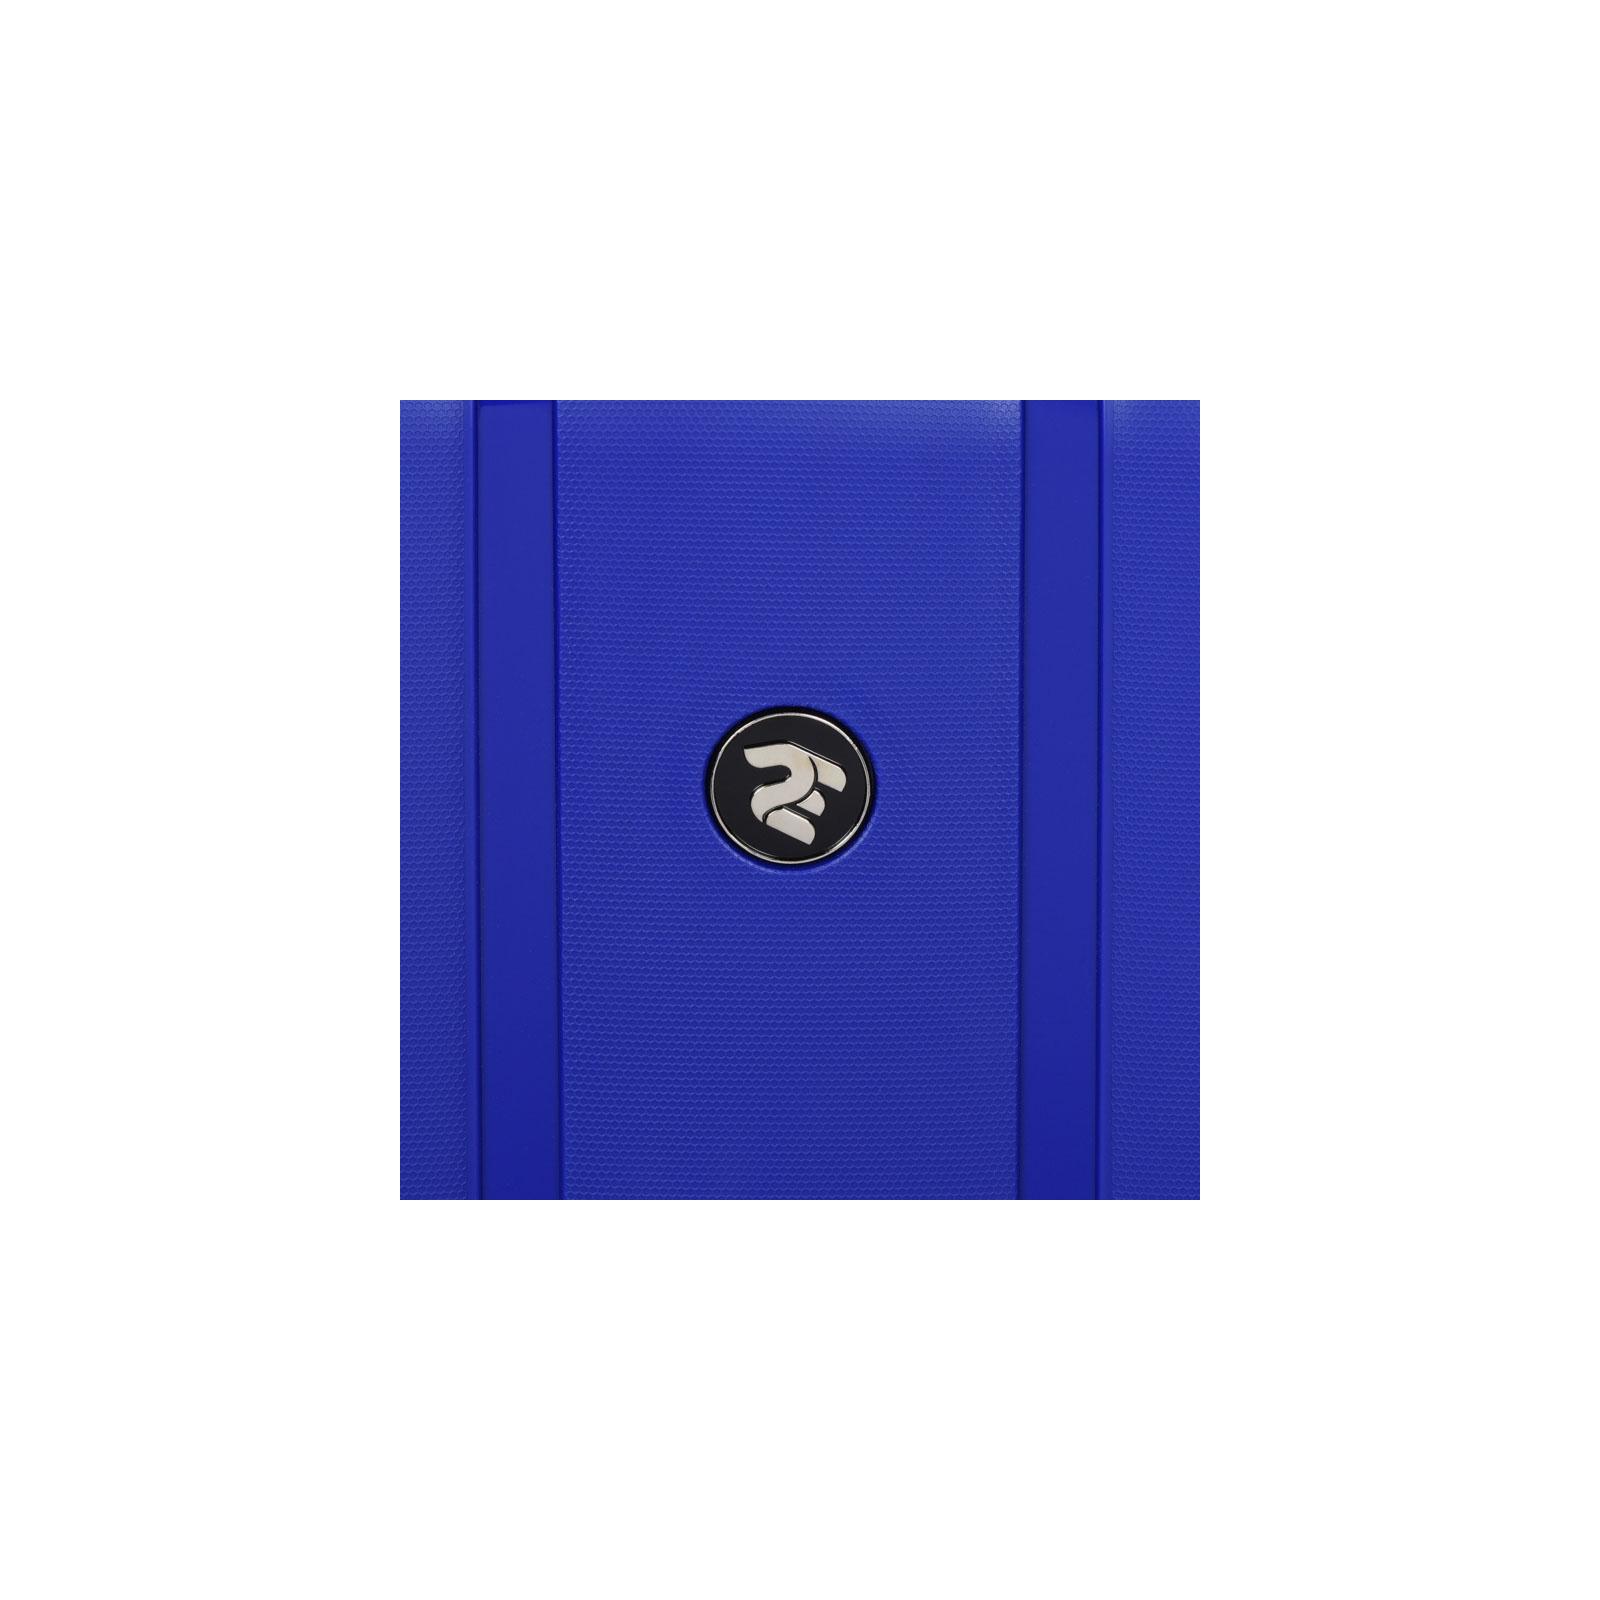 Чемодан 2E Youngster малый голубой (2E-SPPY-S-LB) изображение 9